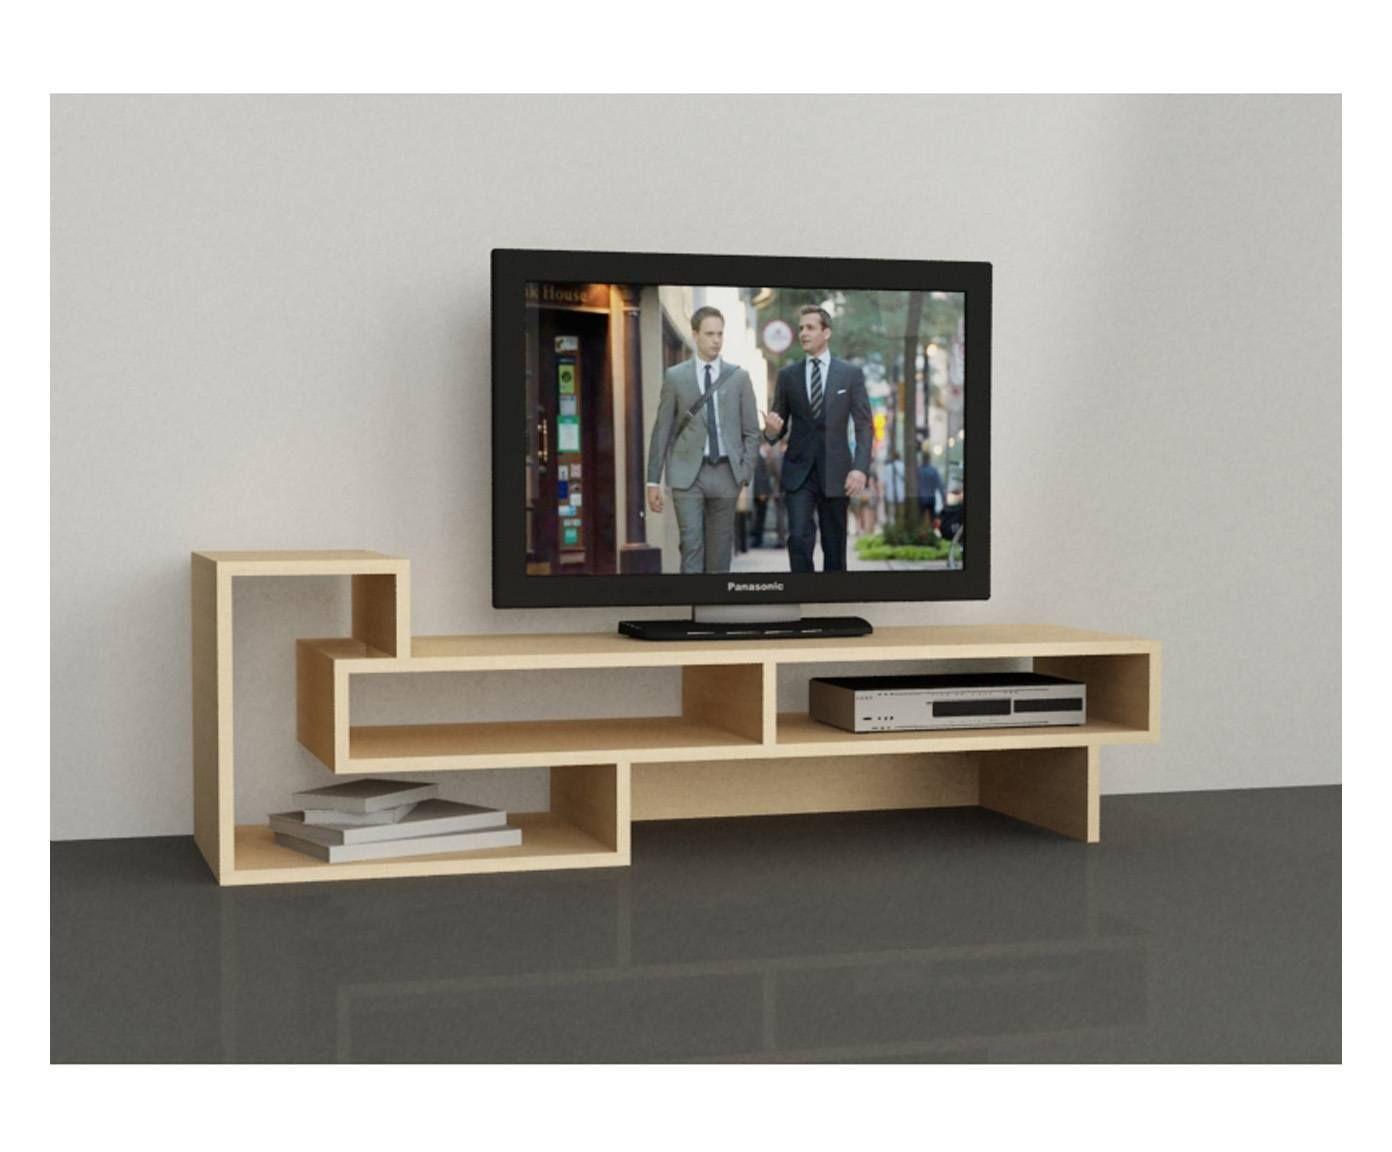 Tv table furniture design - Tv Table